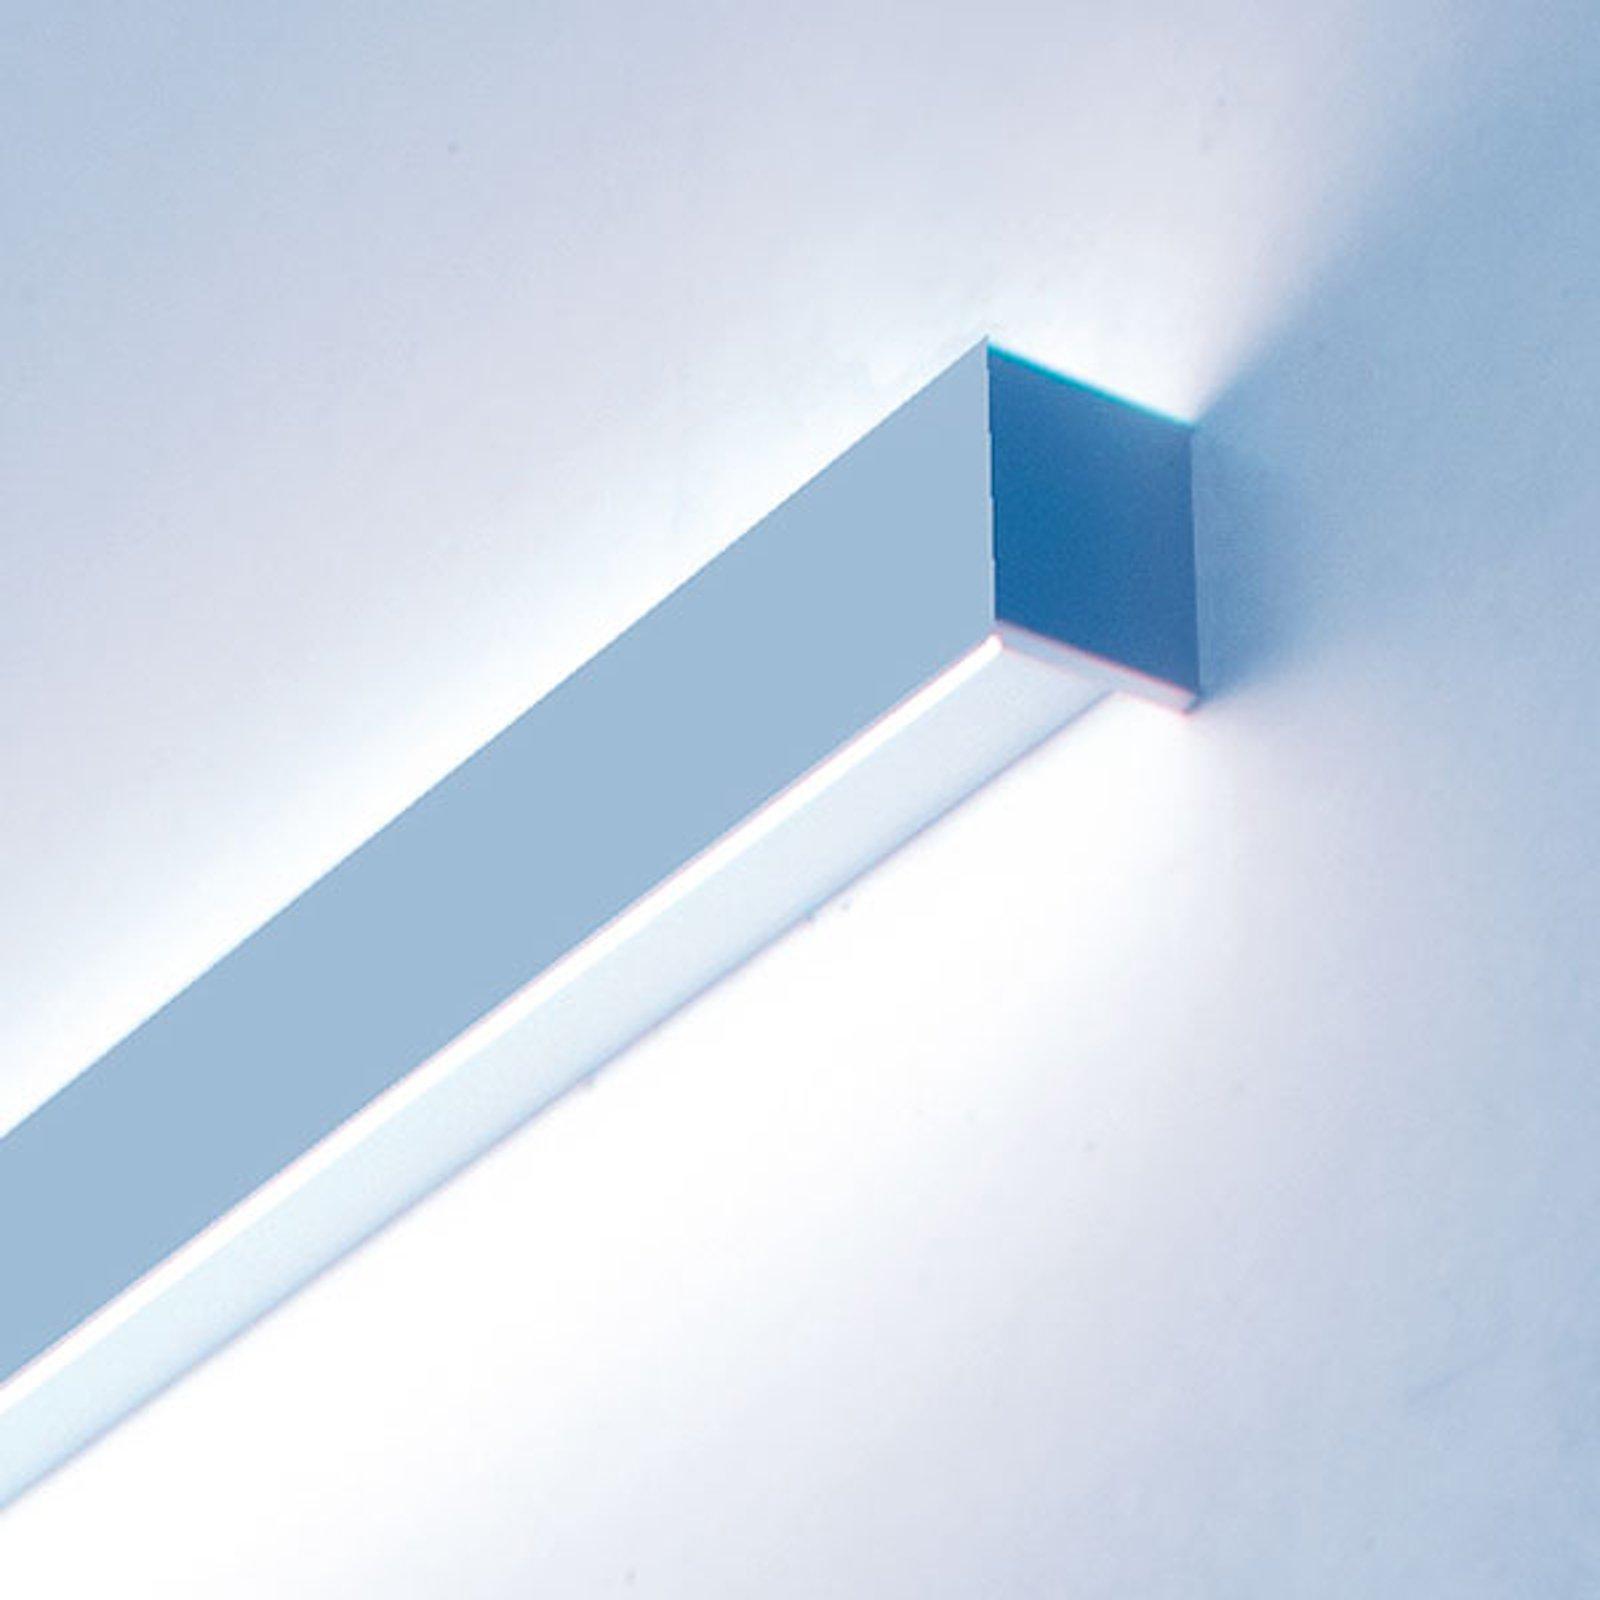 Matric W1 LED-vegglampe i 177 cm, 4 000 K